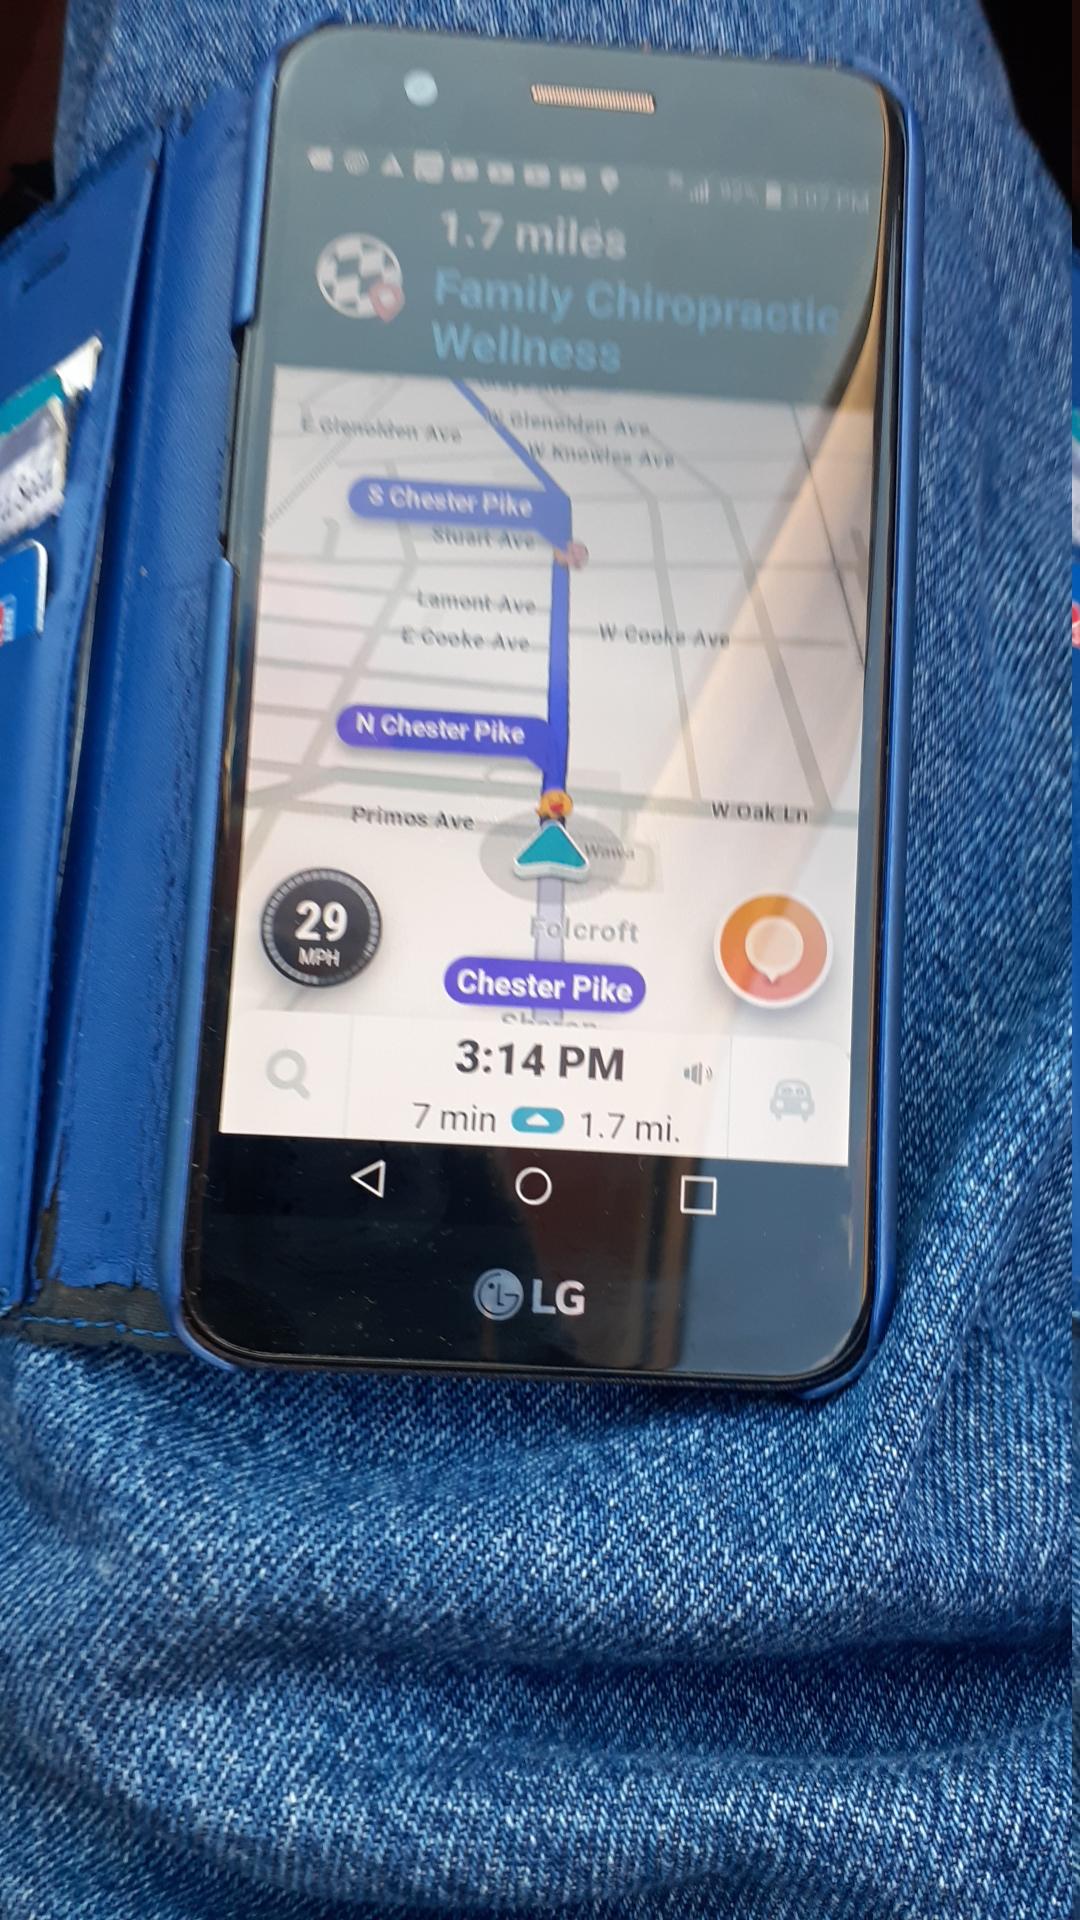 Screenshot of GPS showing I'd arrive at 3:14 PM 01/17/2020